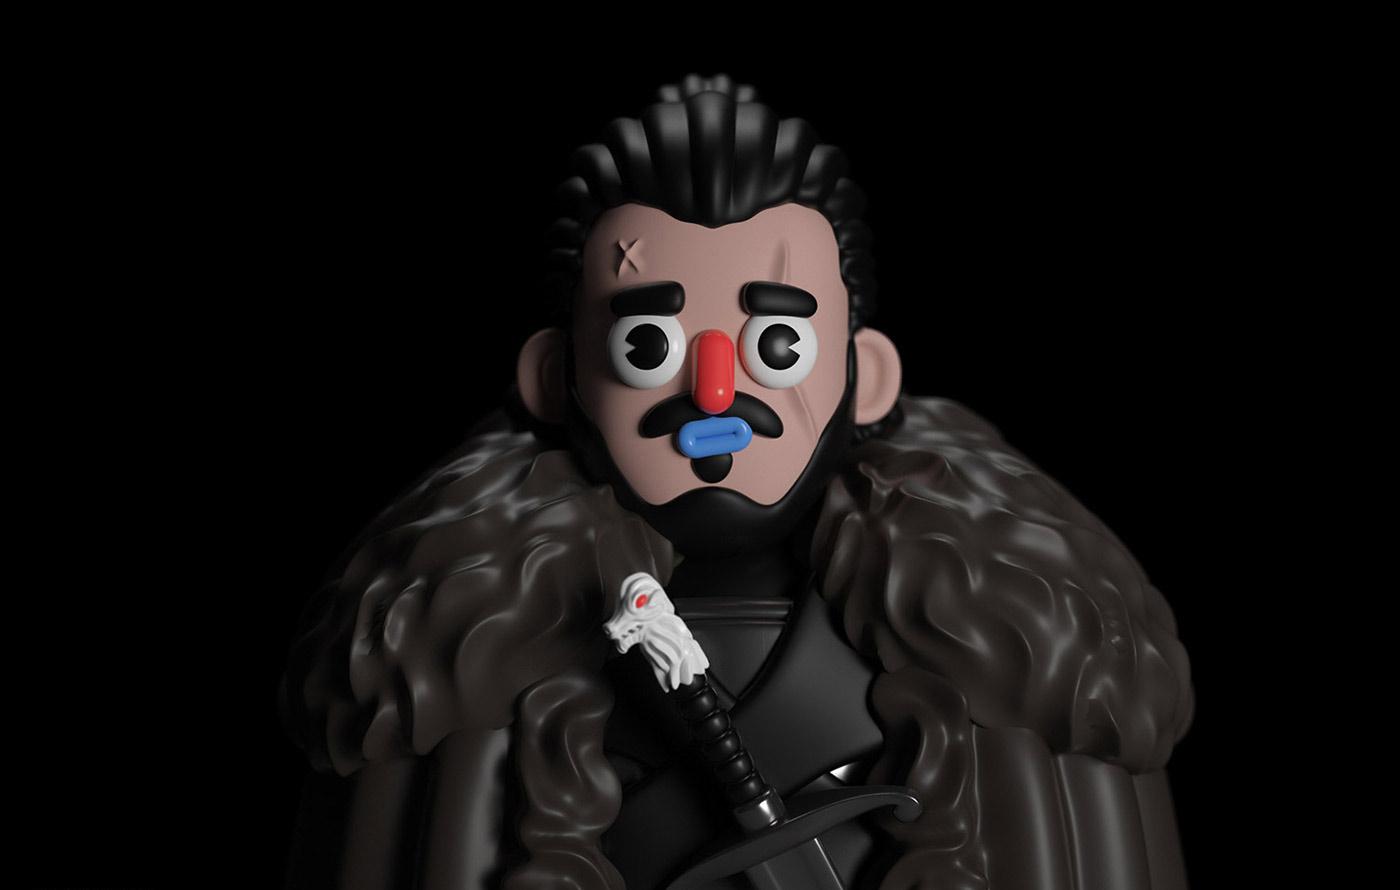 Game of Thrones Fan Art - Character Design & Illustration